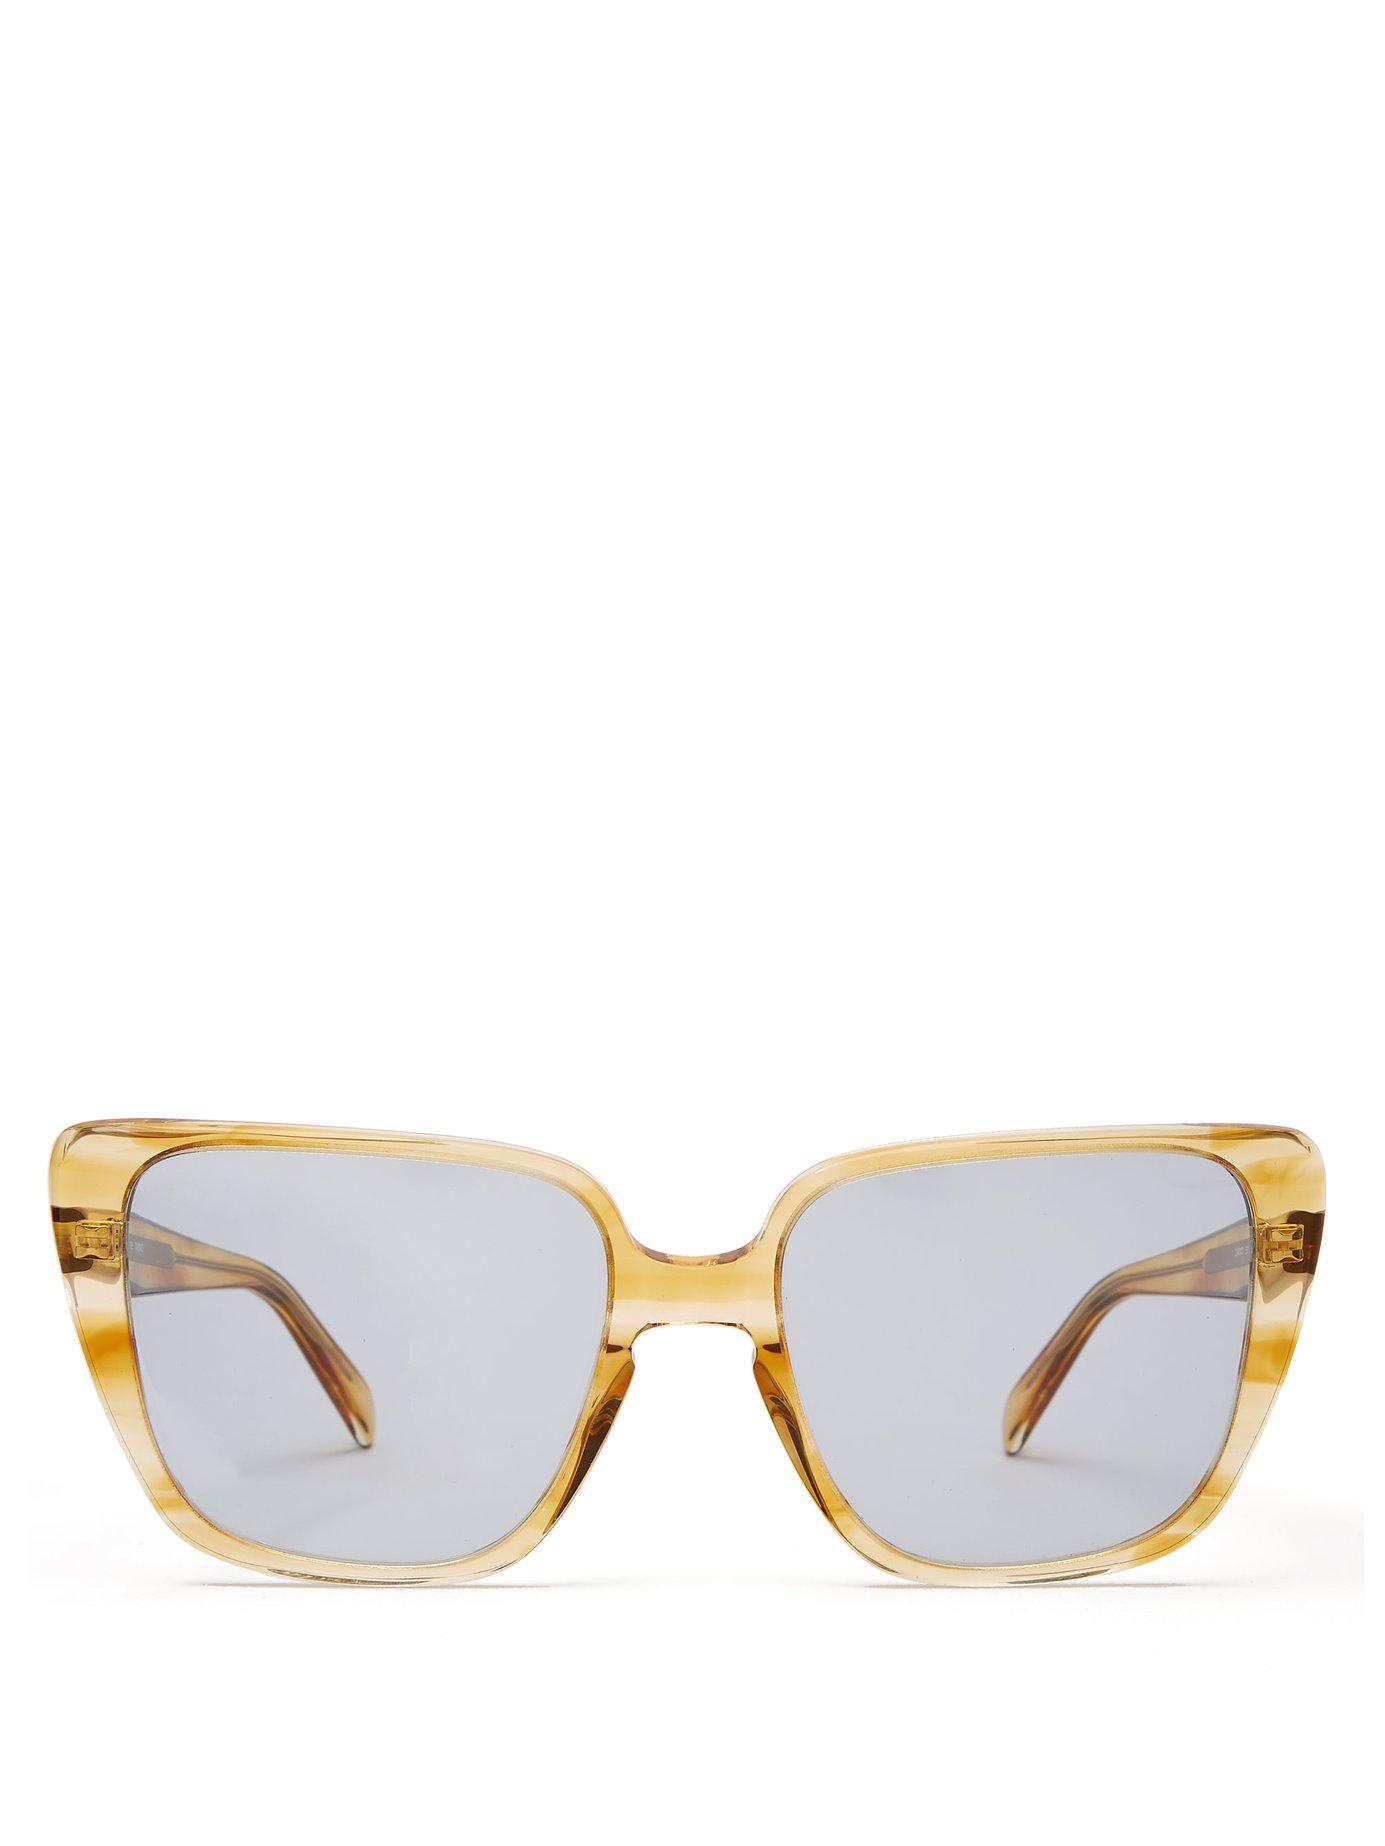 743b1ea2b59 Céline. Women s Square Cat Eye Acetate Sunglasses